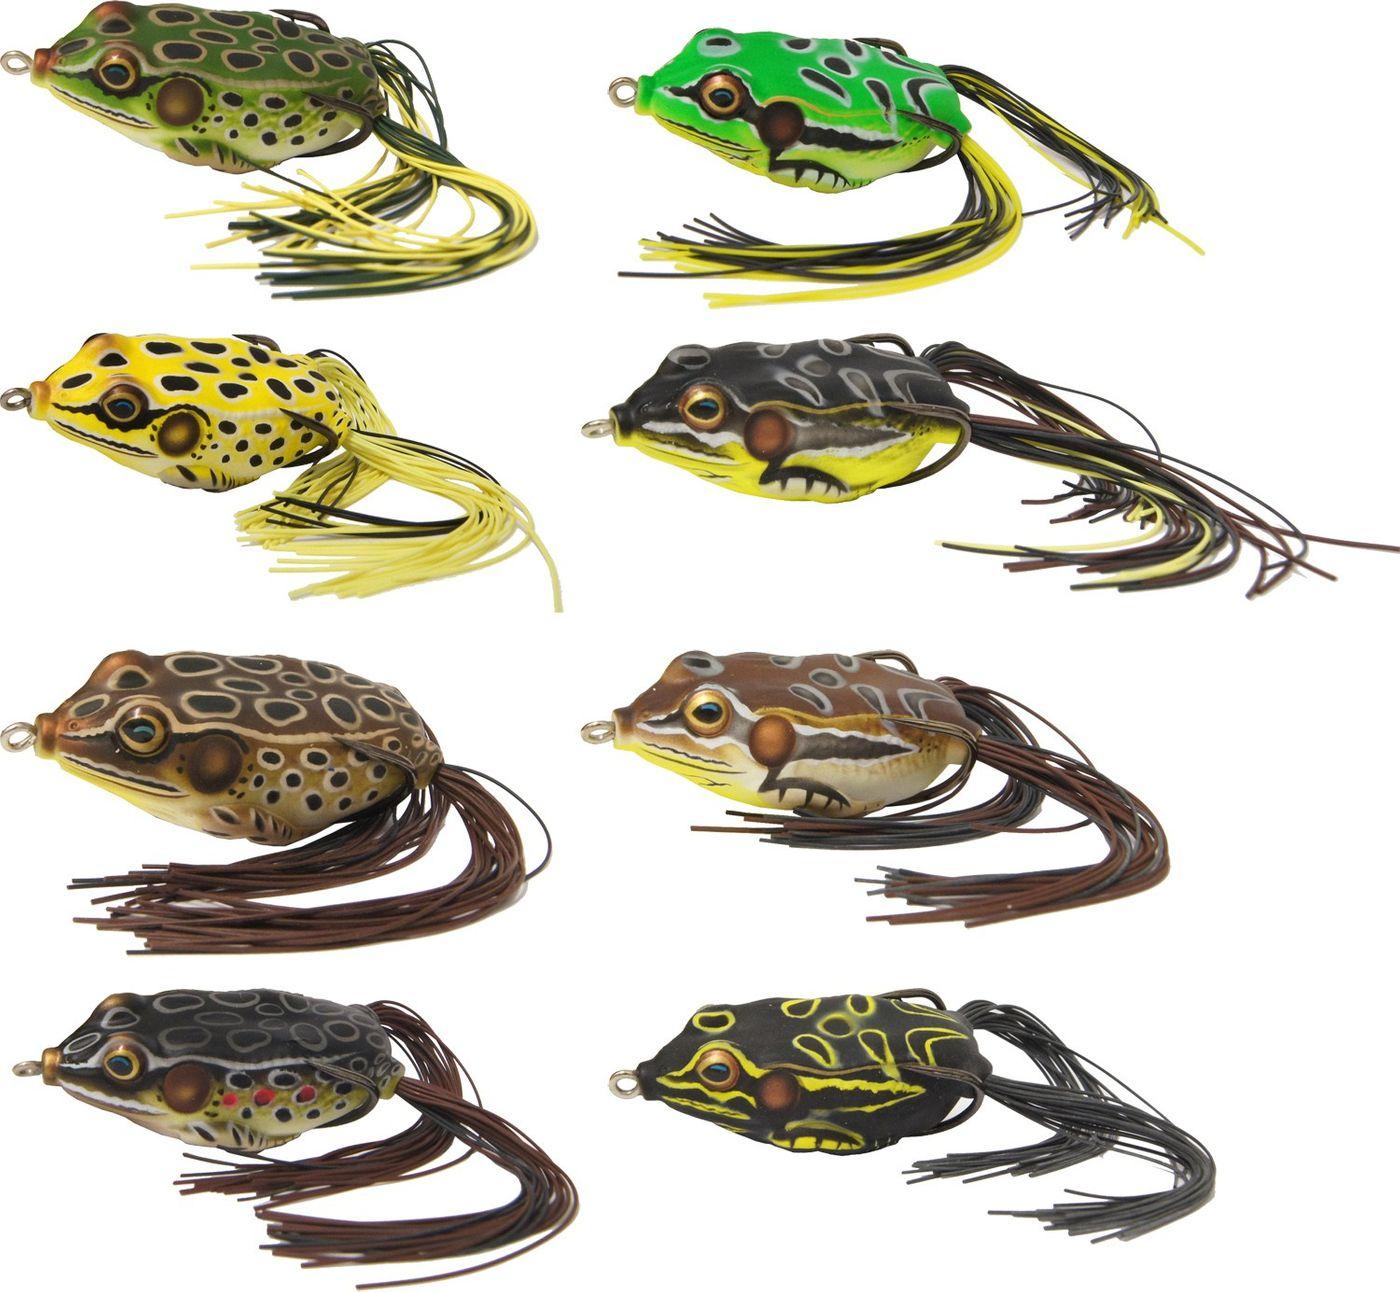 Koppers Frog Hollow - Frosch Wobbler